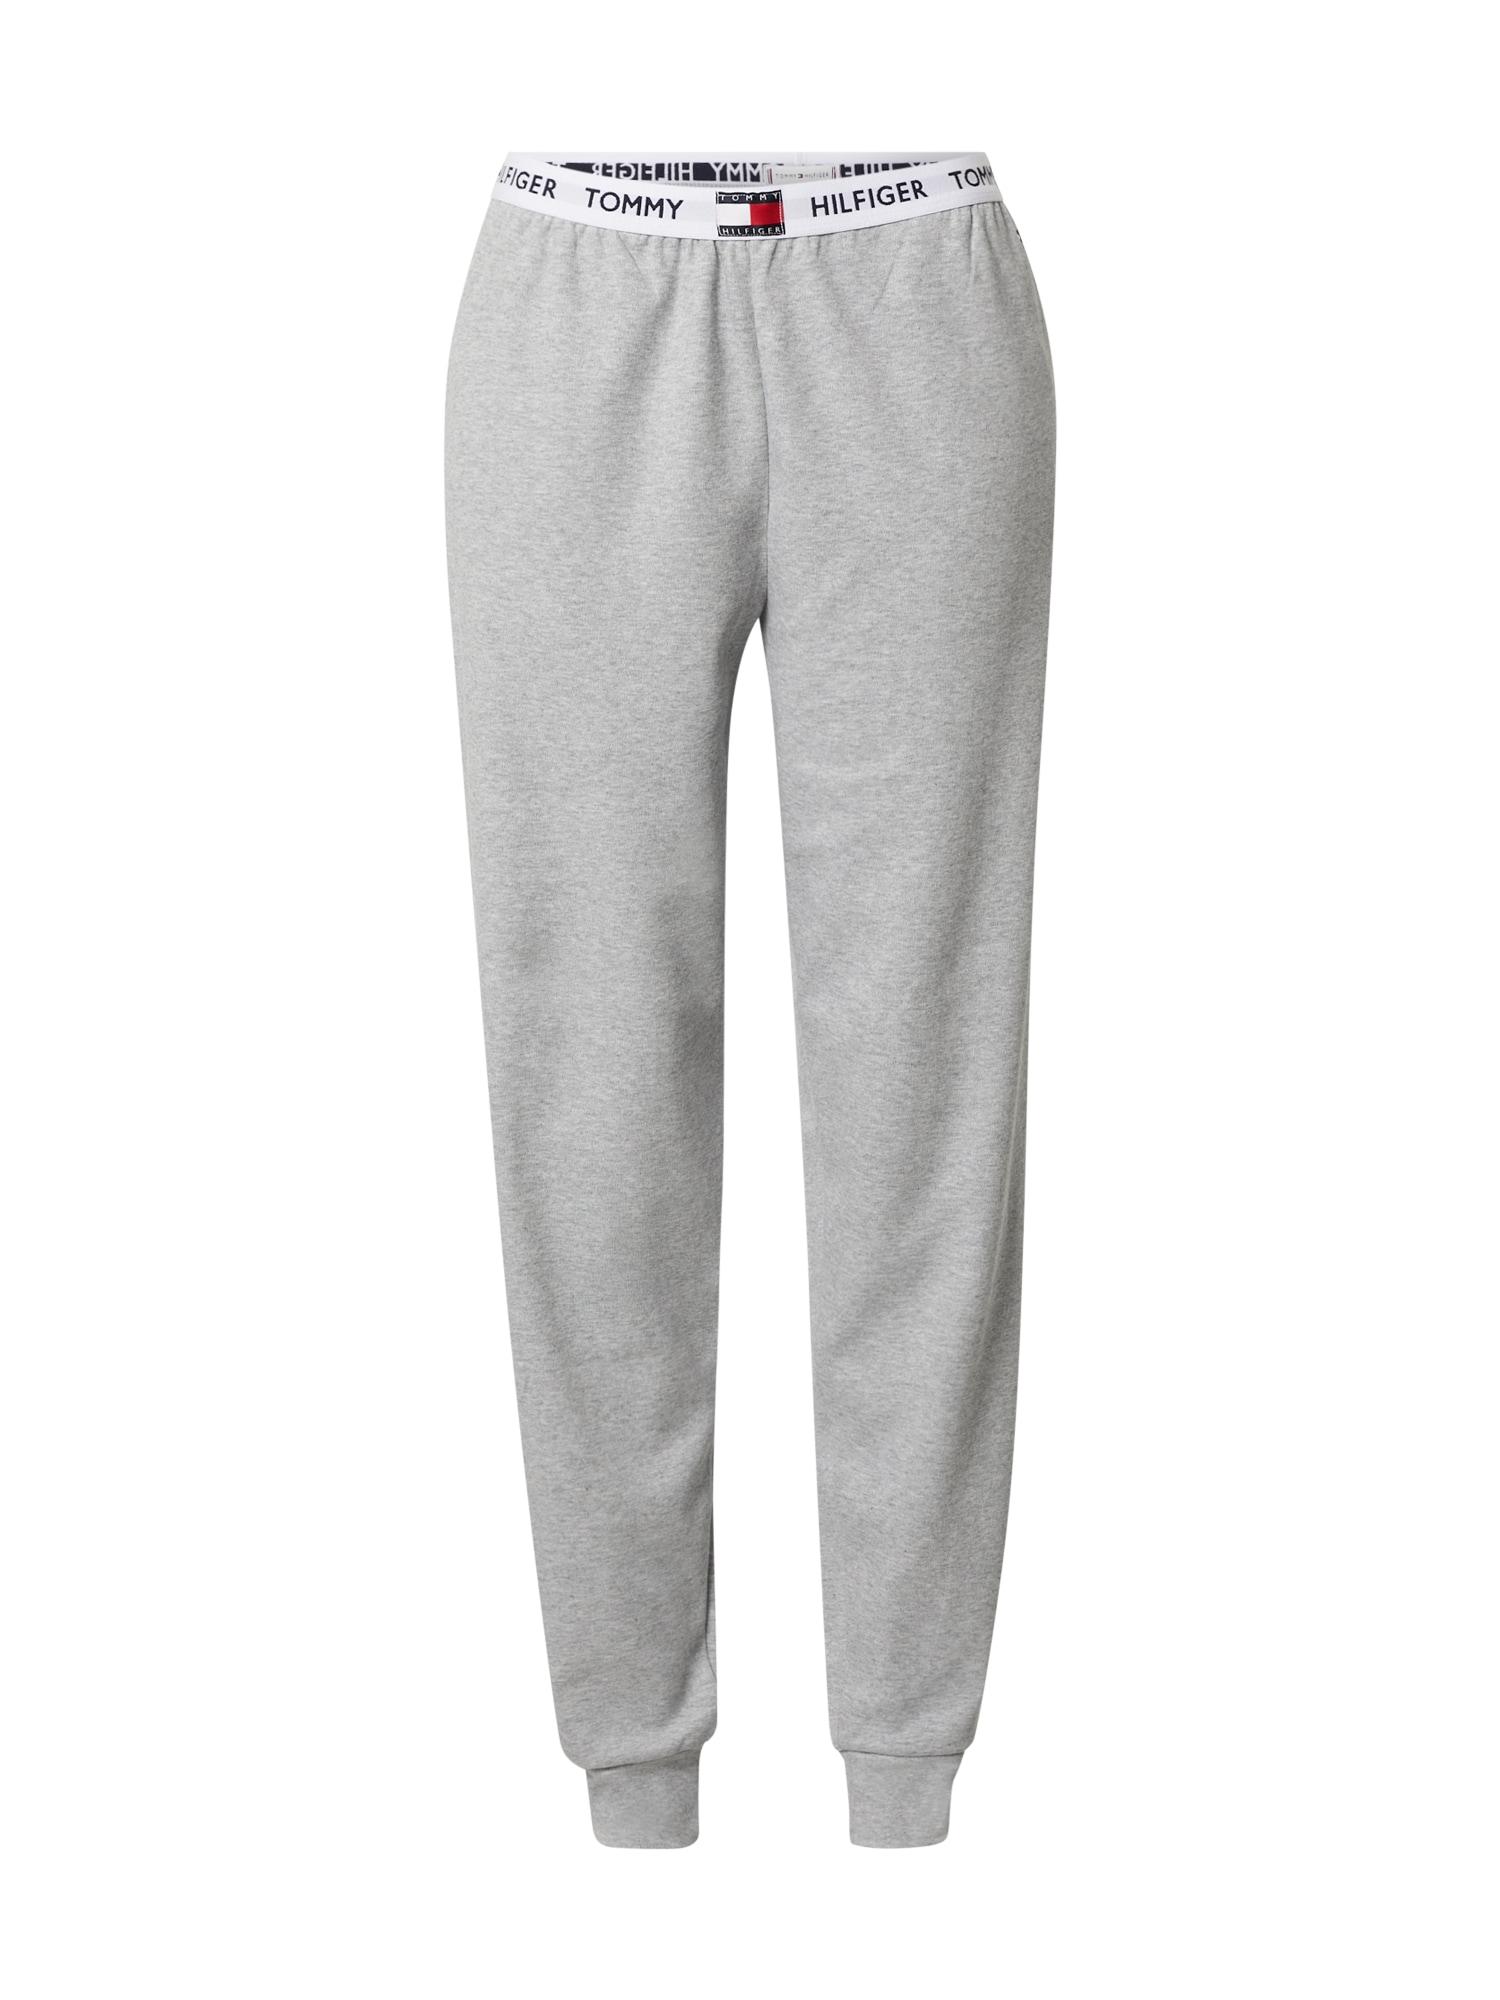 Tommy Hilfiger Underwear Pižaminės kelnės pilka / balta / tamsiai mėlyna / raudona